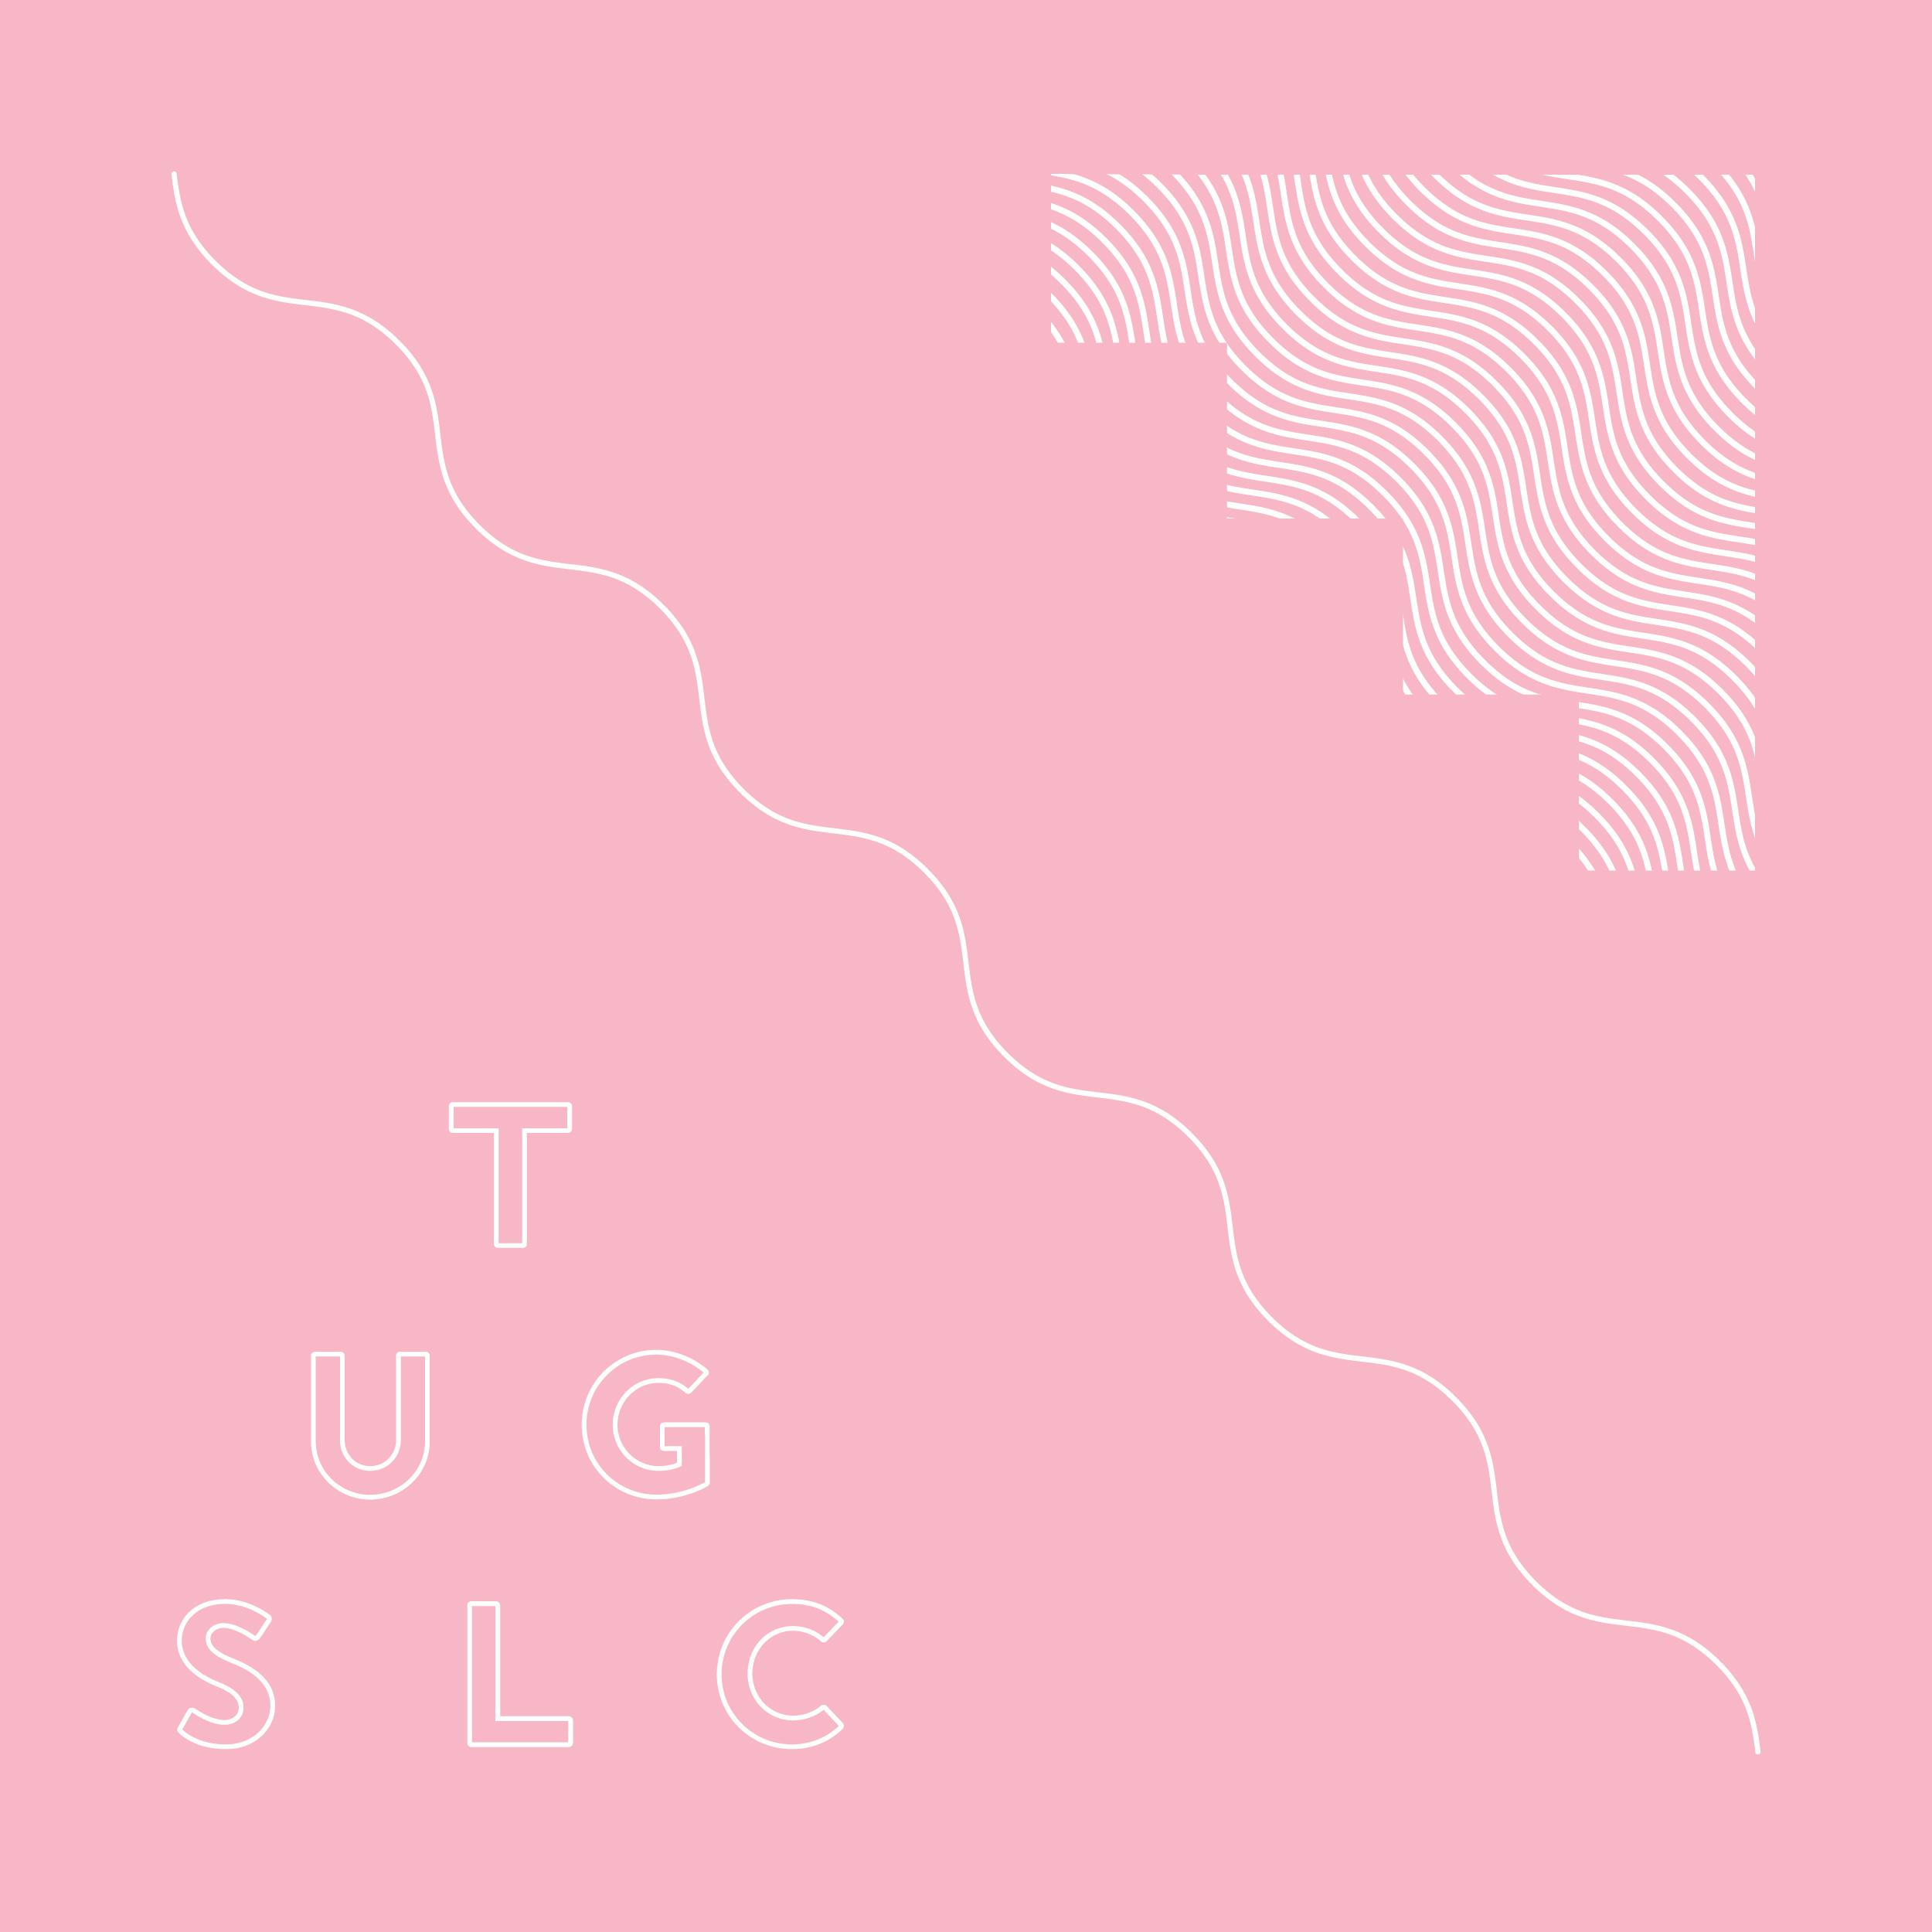 TheUG-04.jpg